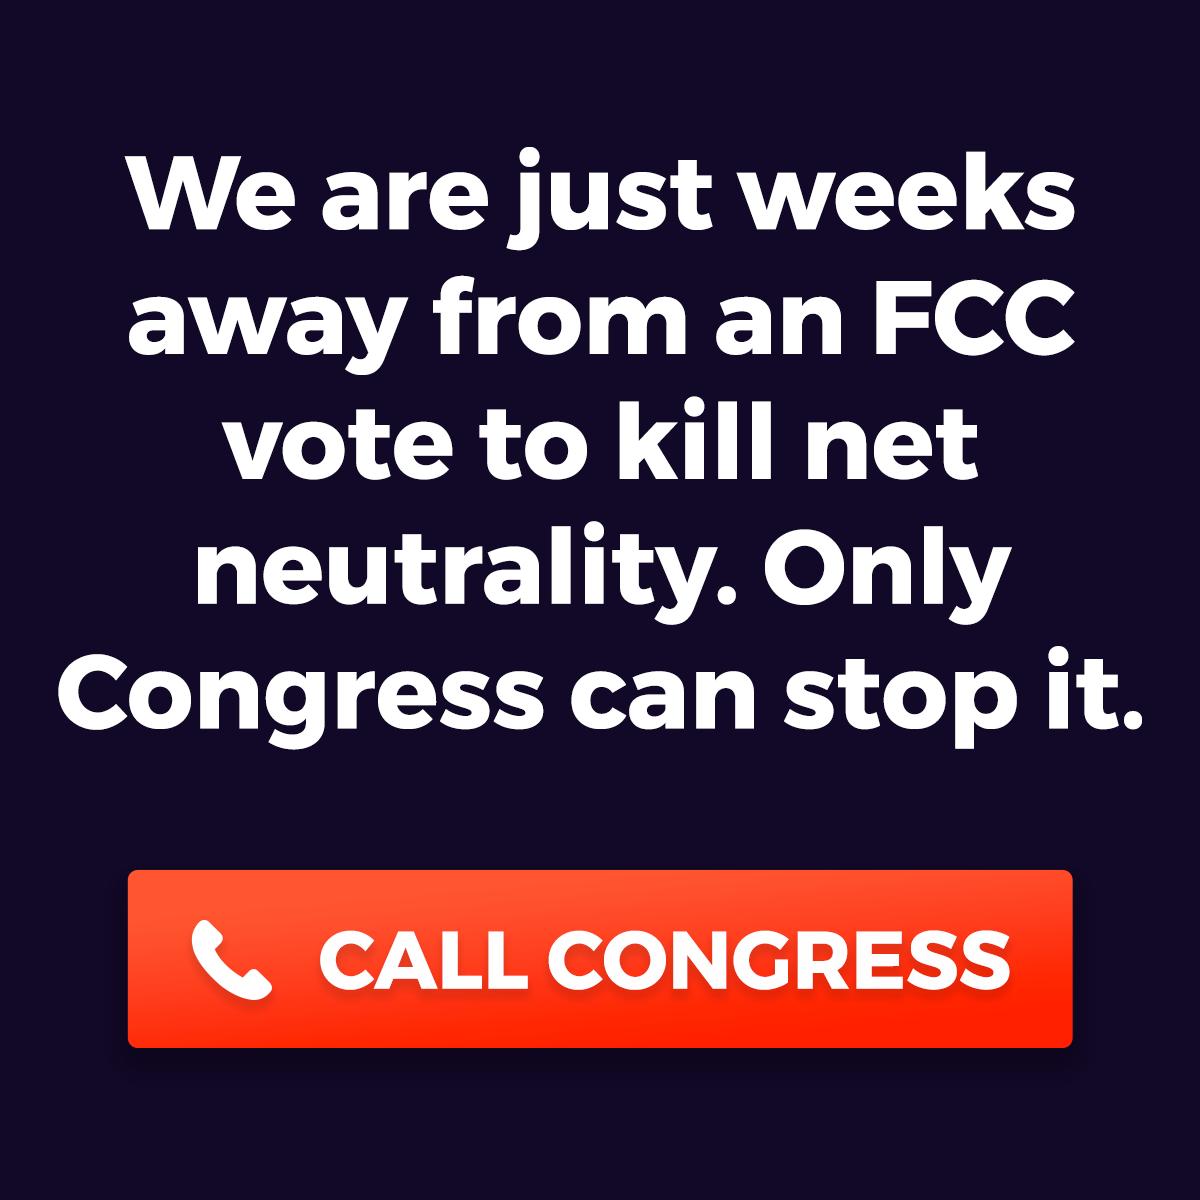 I support Net Neutrality